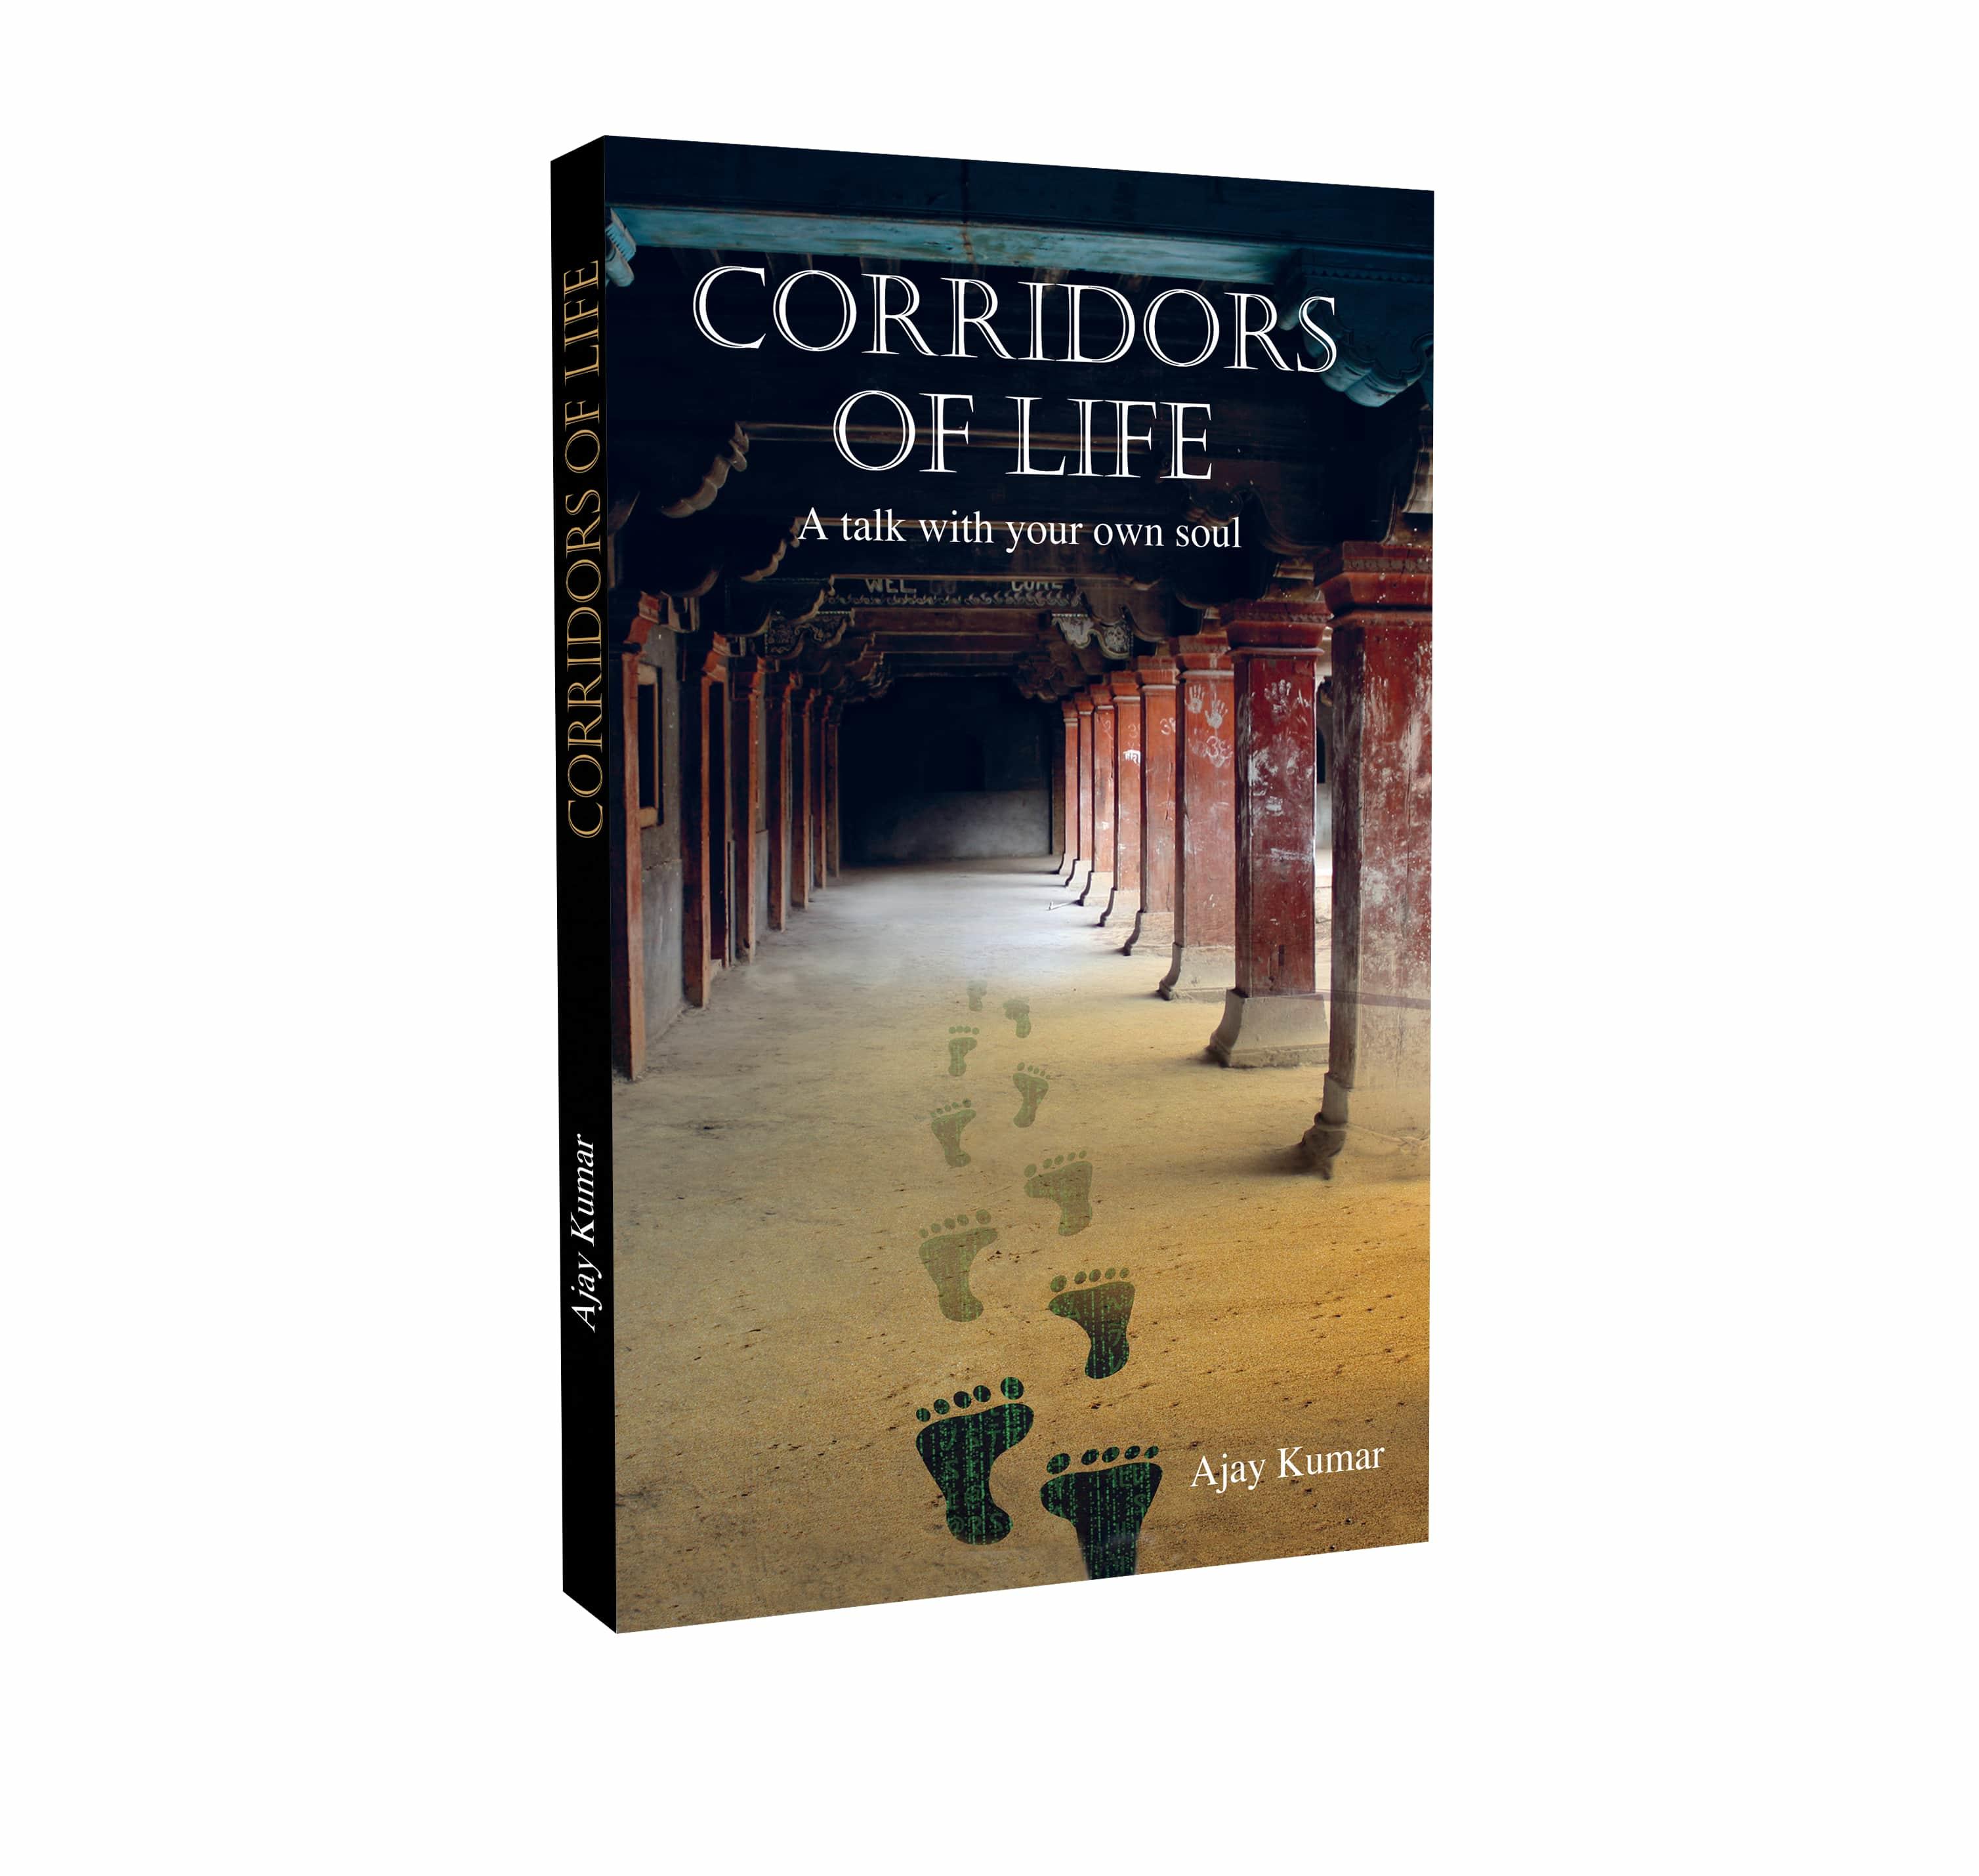 corridors of life - Copy